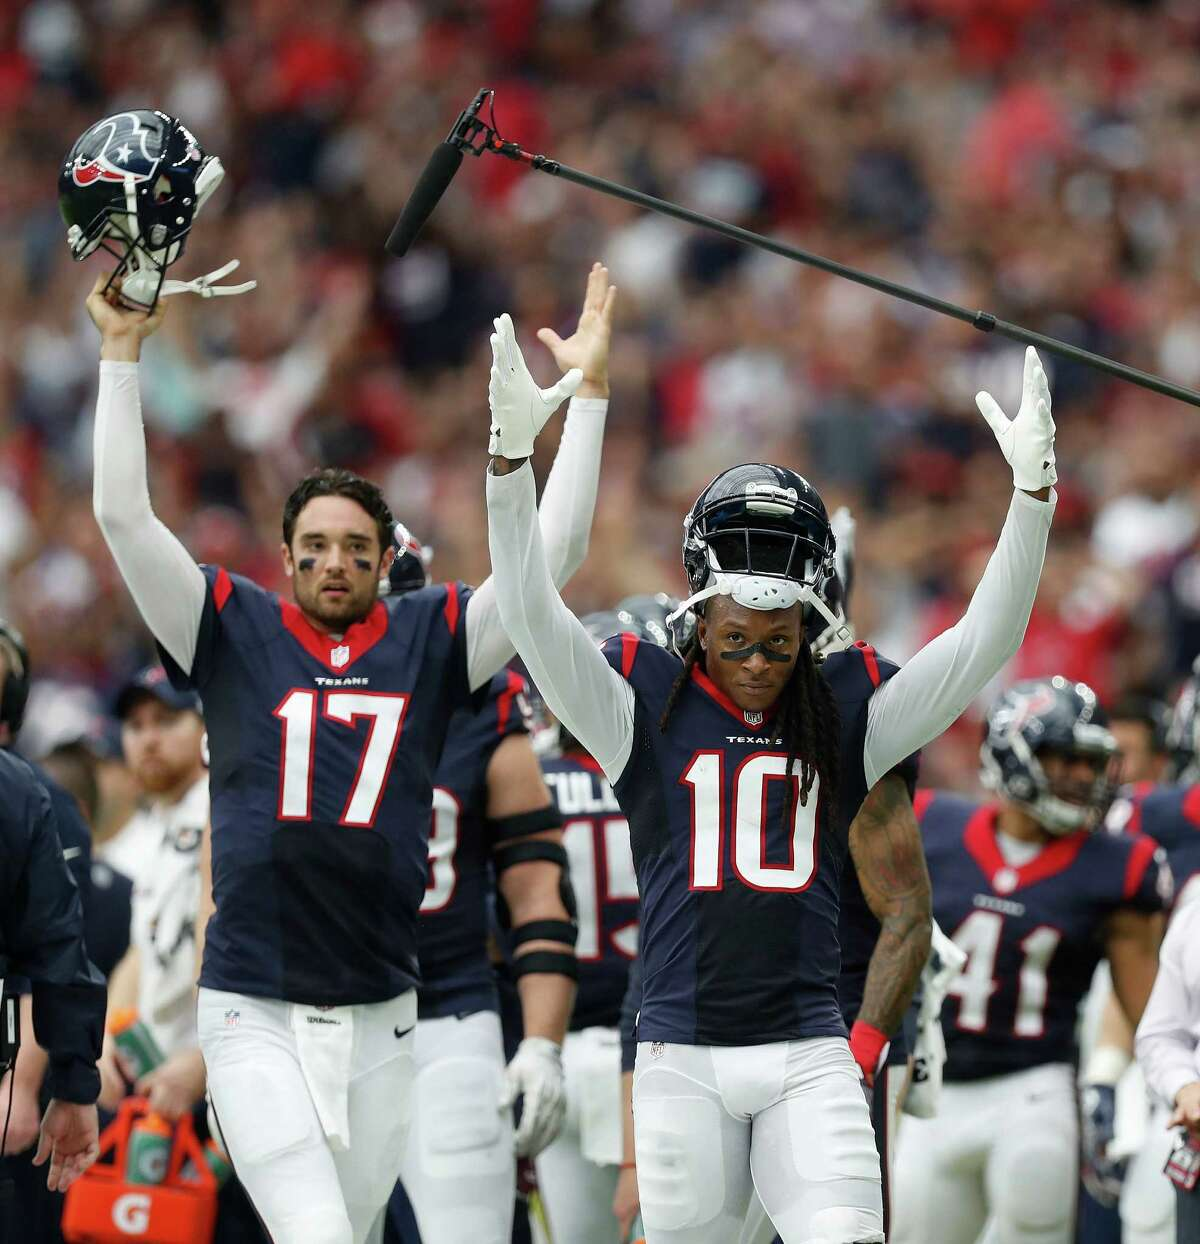 Houston (5-3) plus-2 at Jacksonville (2-6) Texans 23-17